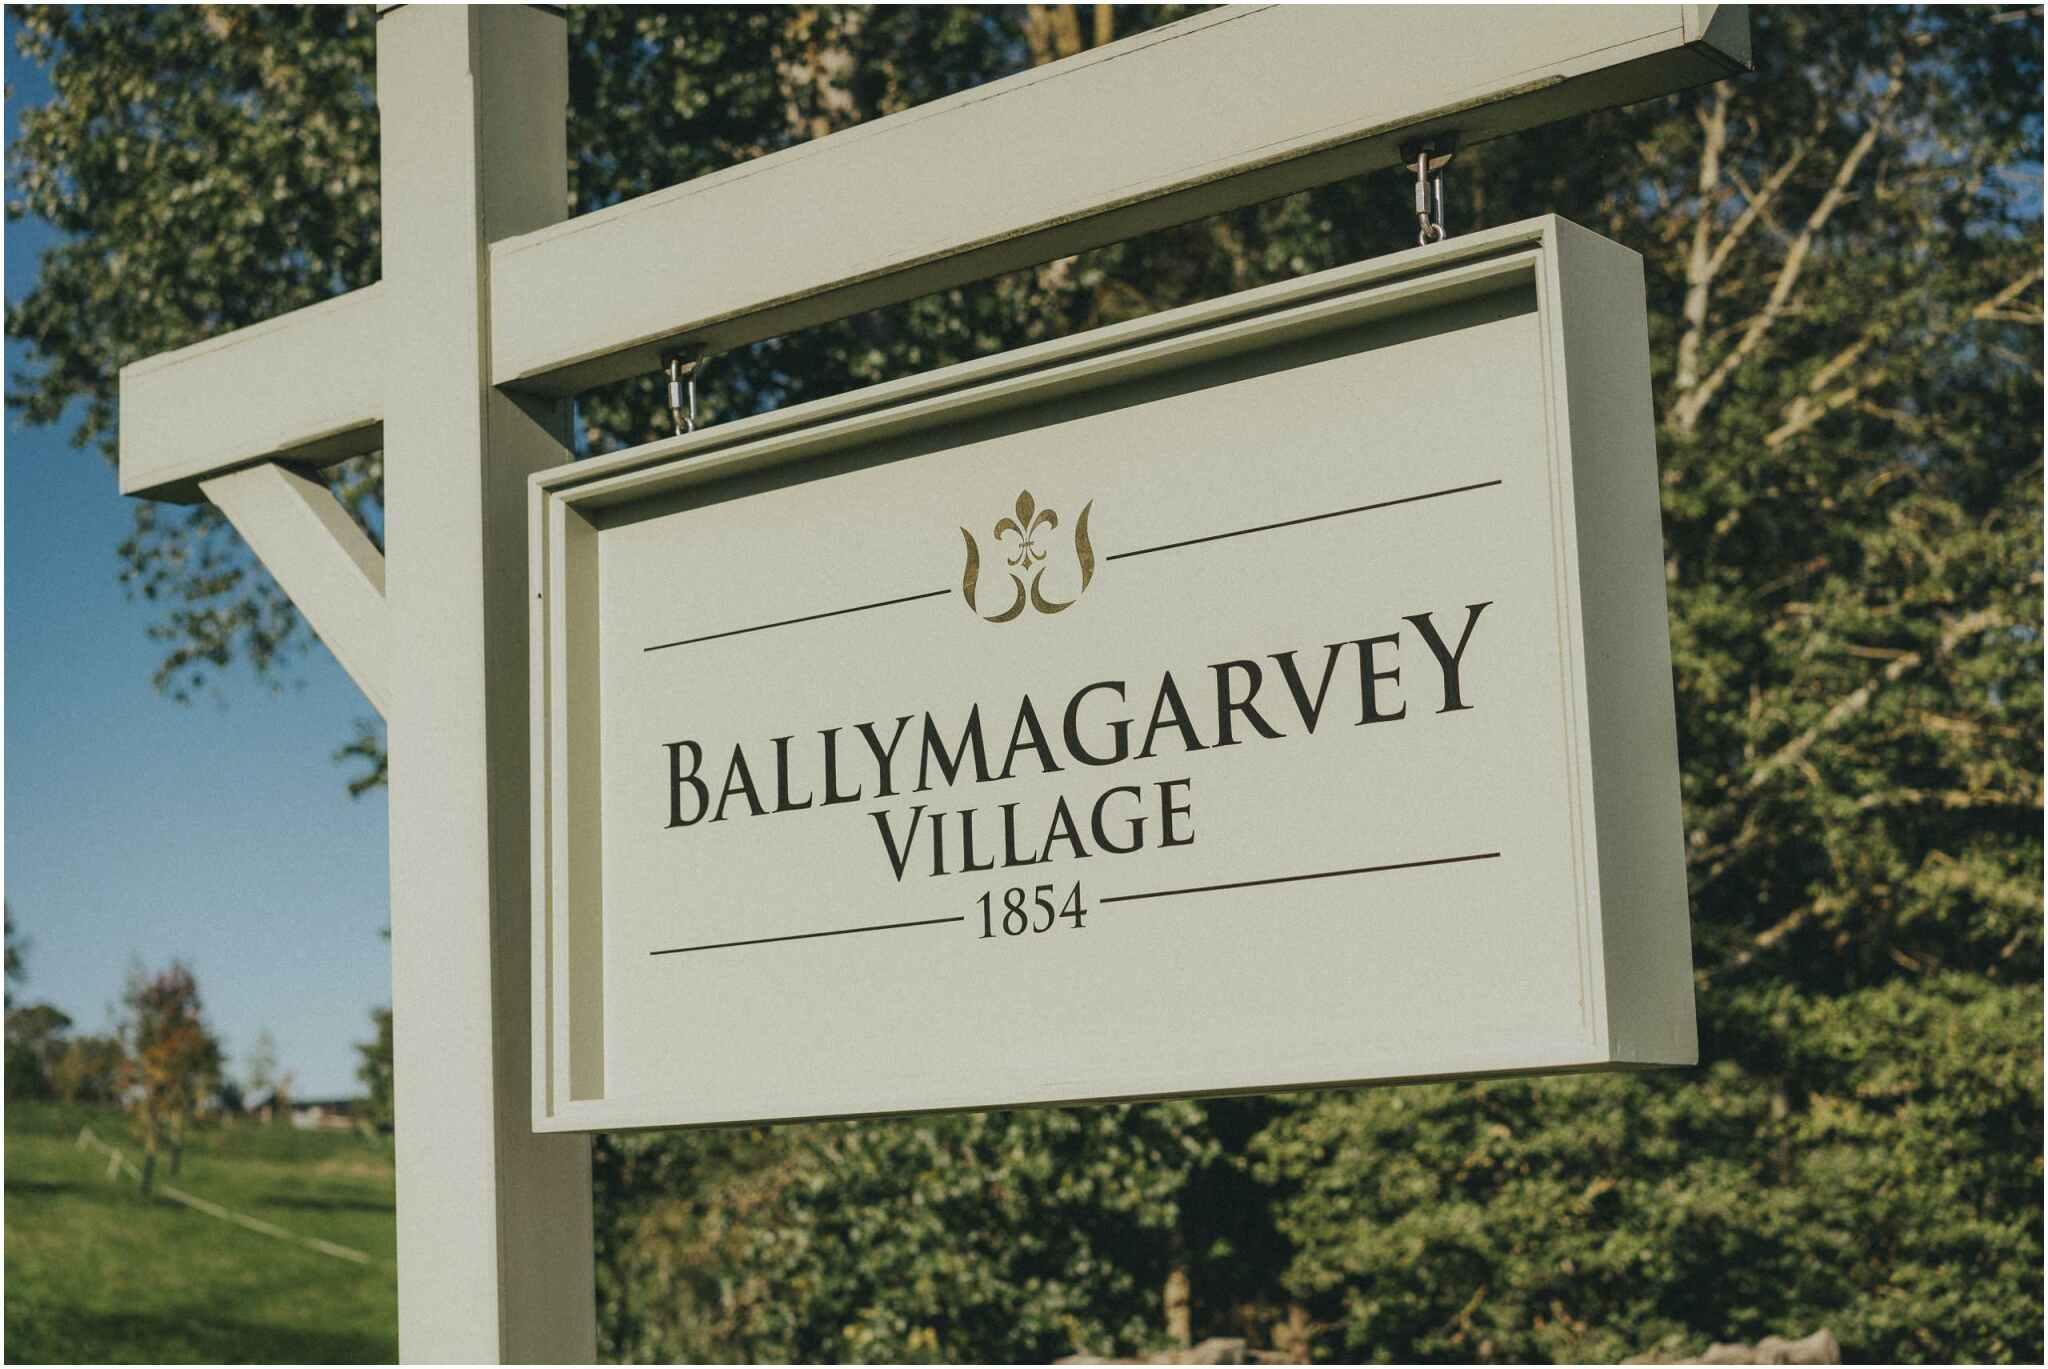 Elaine + Michael - Ballymagarvey Villiage 1